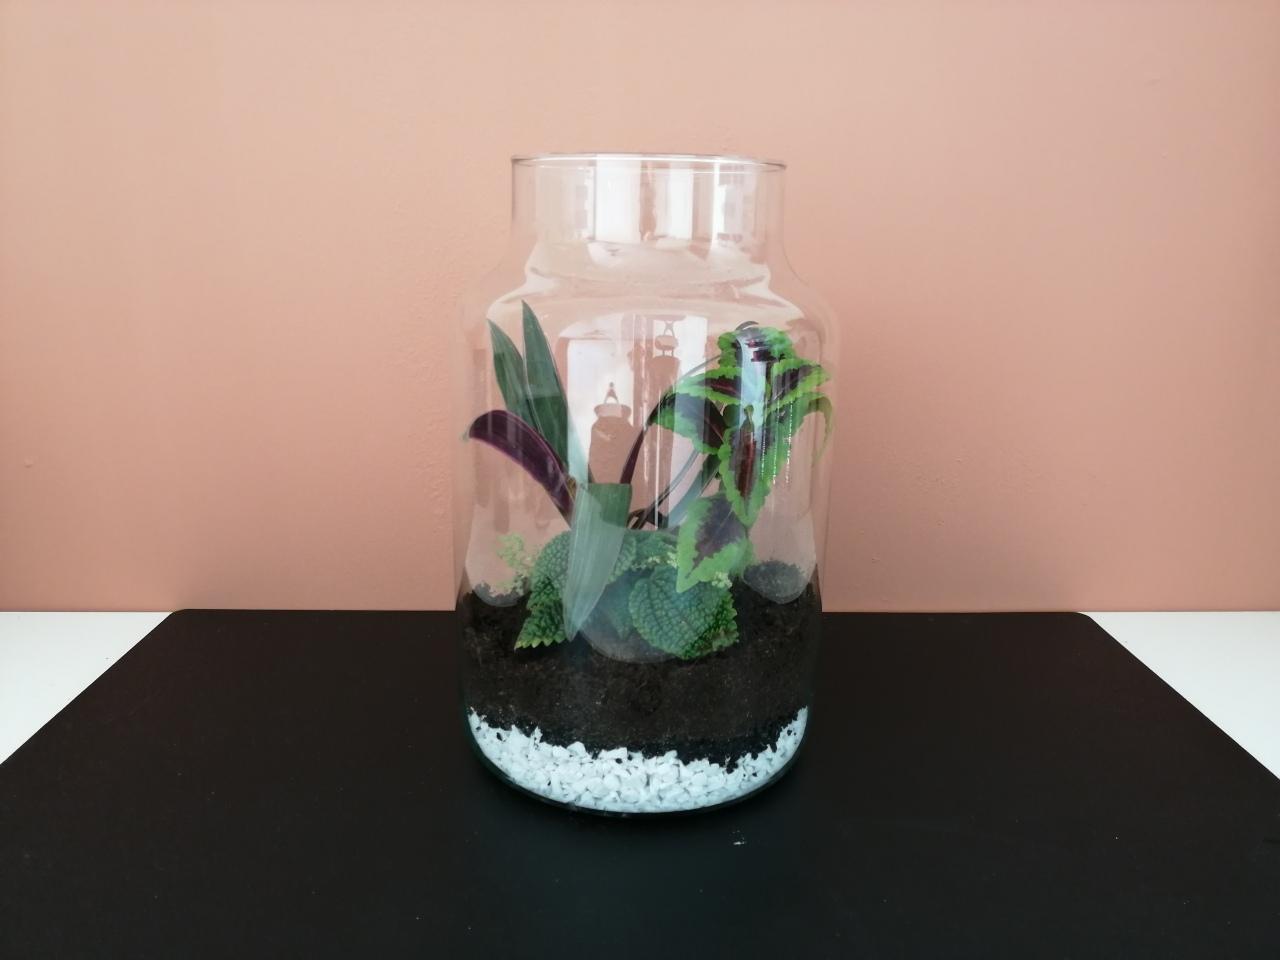 Maak je eigen planten terrarium